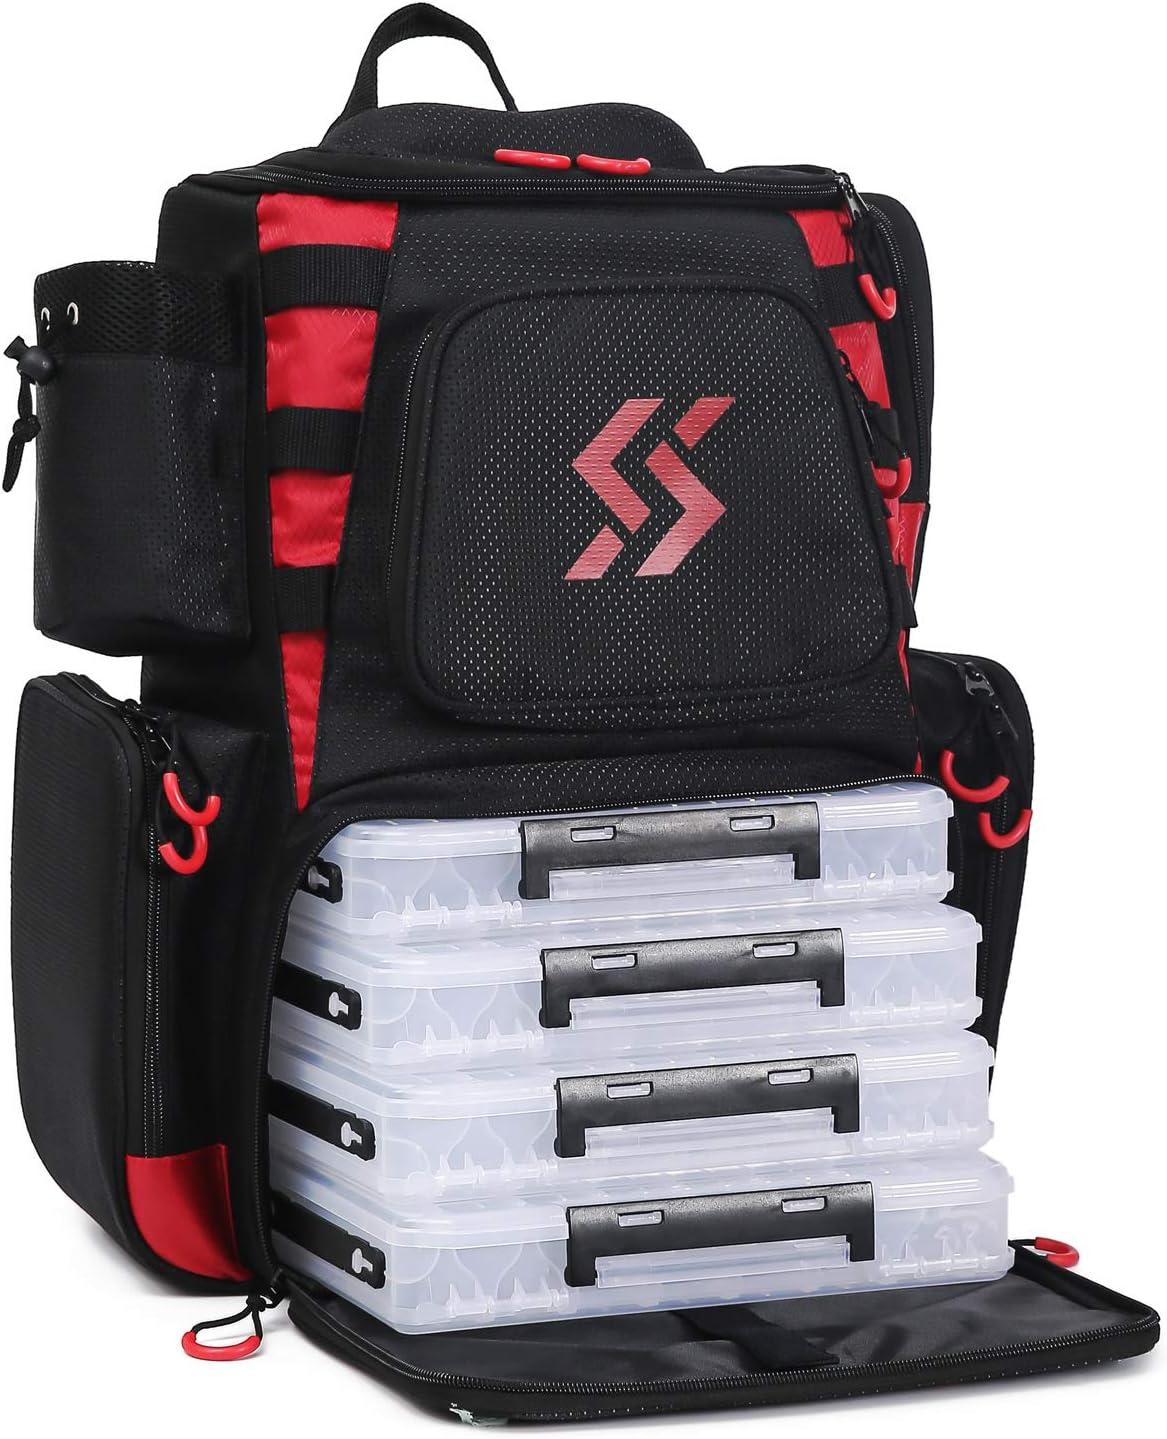 Sougayilang Portable Foldable Multifunctional Lure Fishing backpack